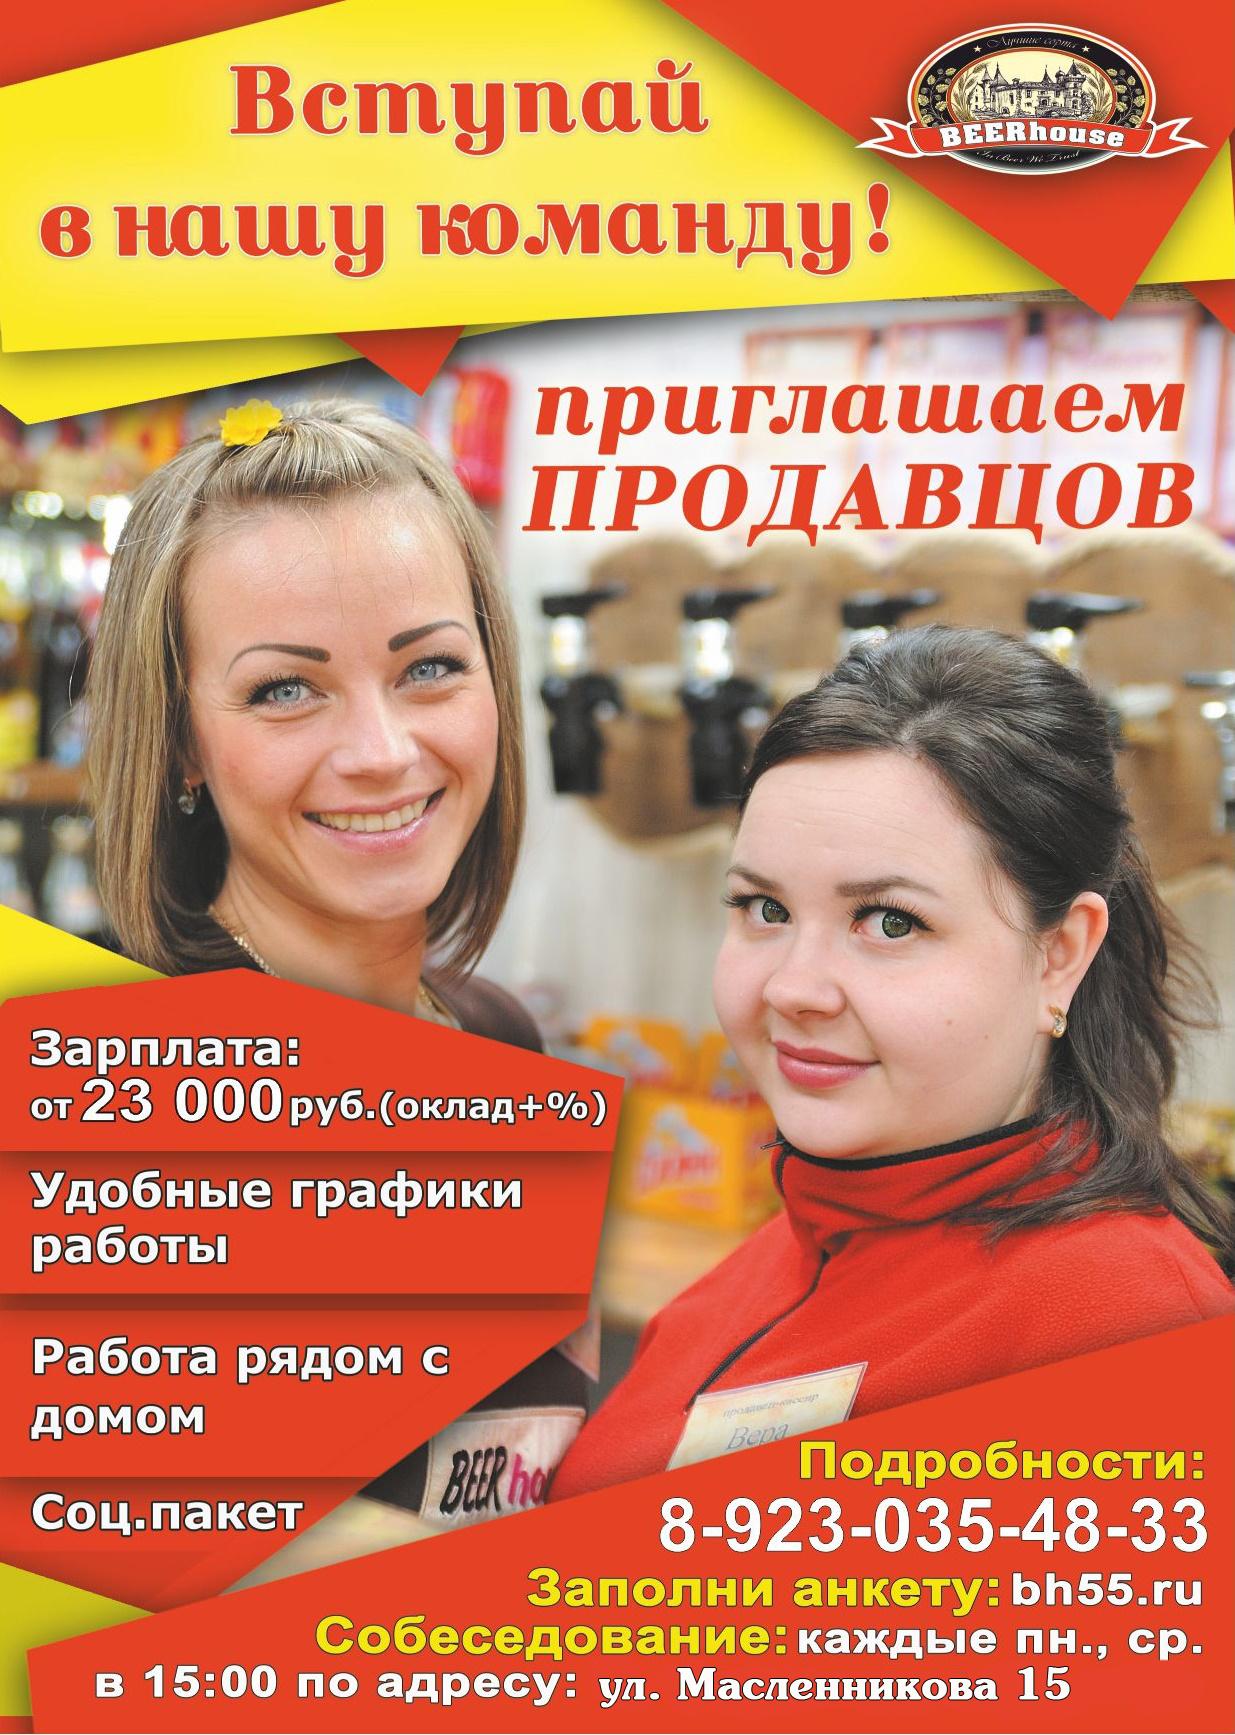 http://bh55.ru/wp-content/uploads/2019/01/prodavets-kopiya.jpg